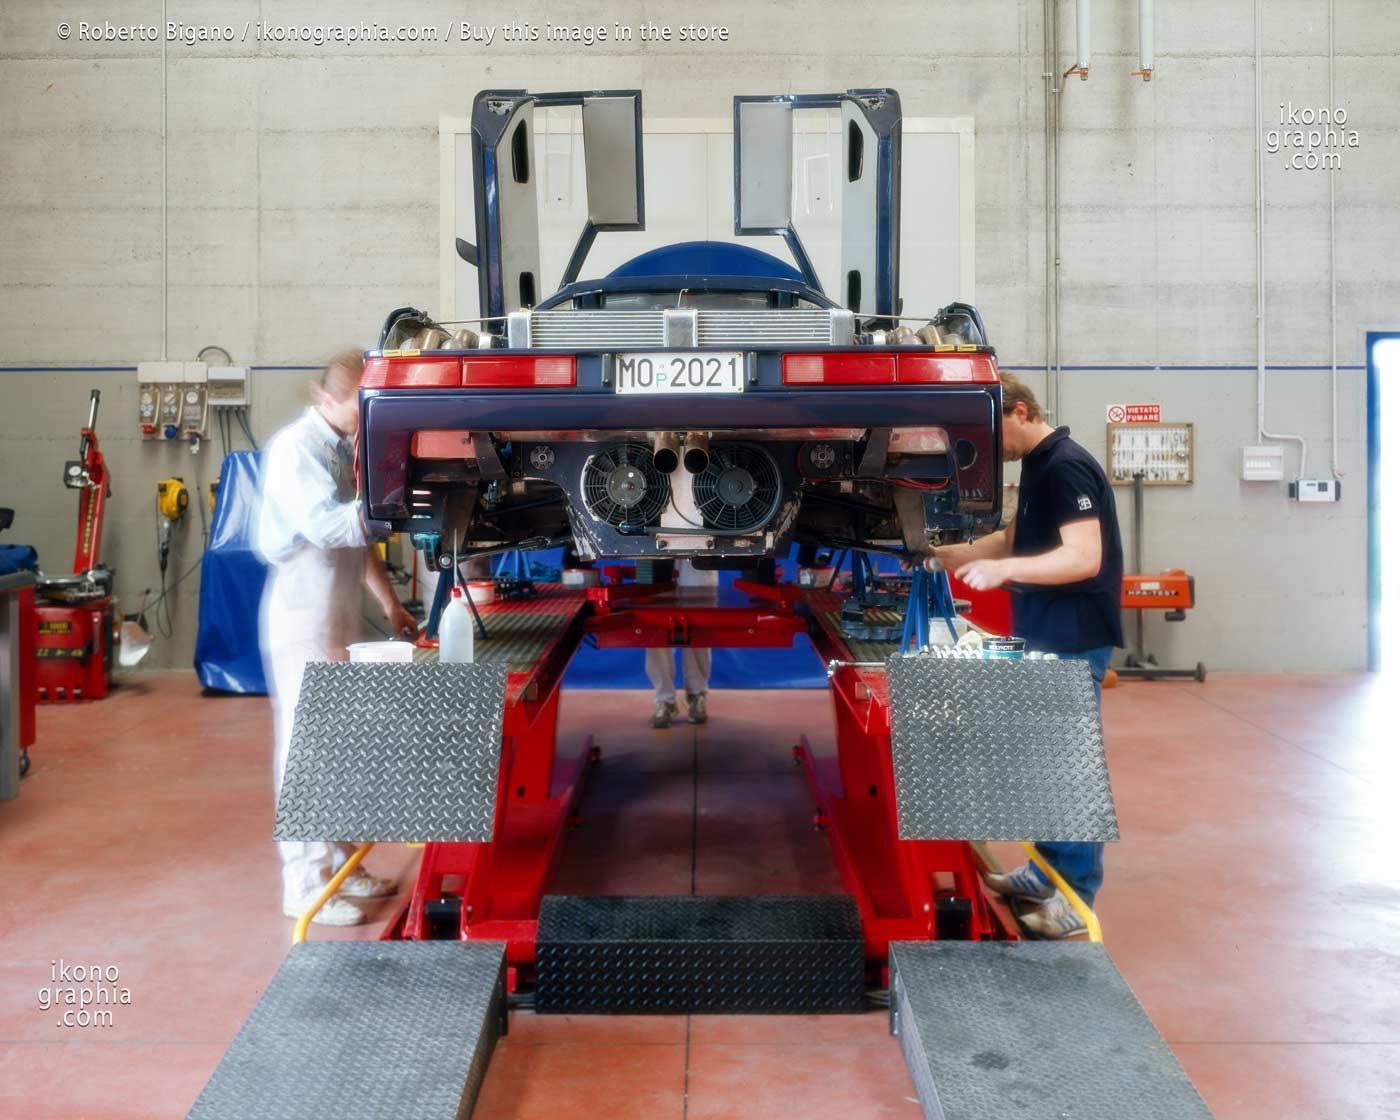 1937_60 Works in progress at Bugatti Automobili. . Photo by Roberto Bigano. Buy this image in the ikonographia.com store.